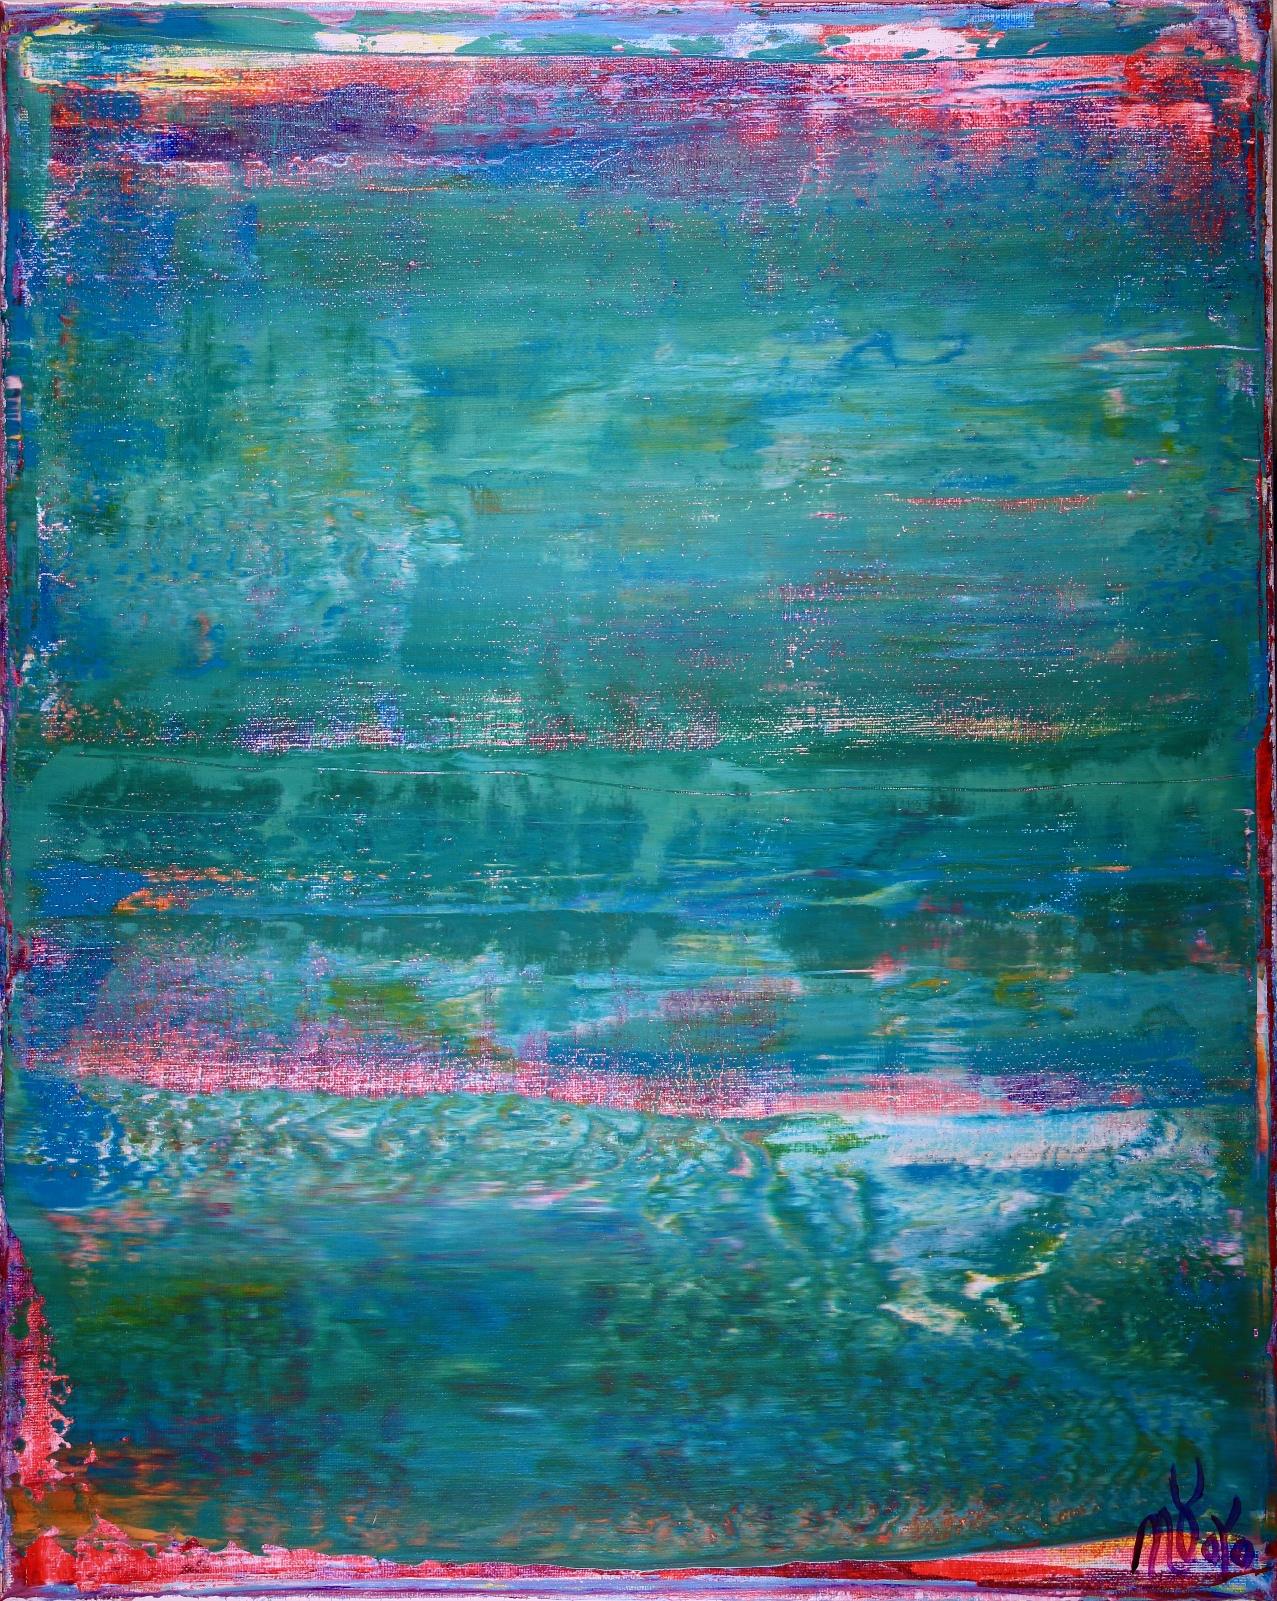 Full Image - Shades of Aqua Green by Nestor Toro